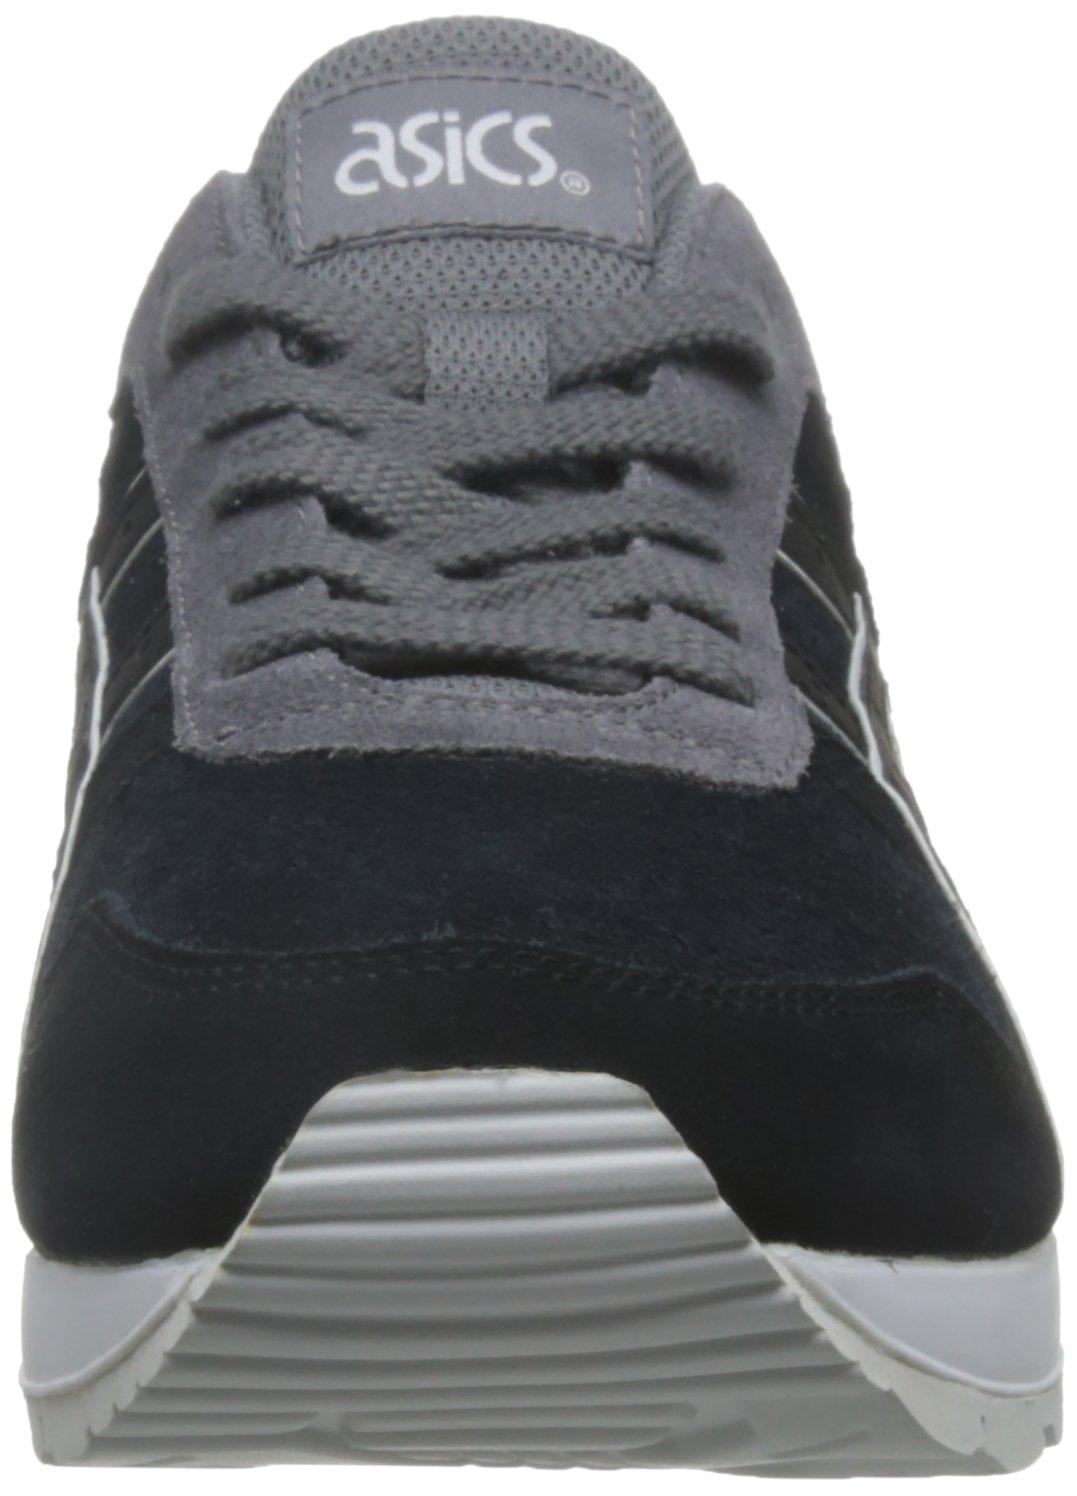 ASICS B00ZQ8B7SK GT II Retro Sneaker B00ZQ8B7SK ASICS 7 M US Black/Grey 535213